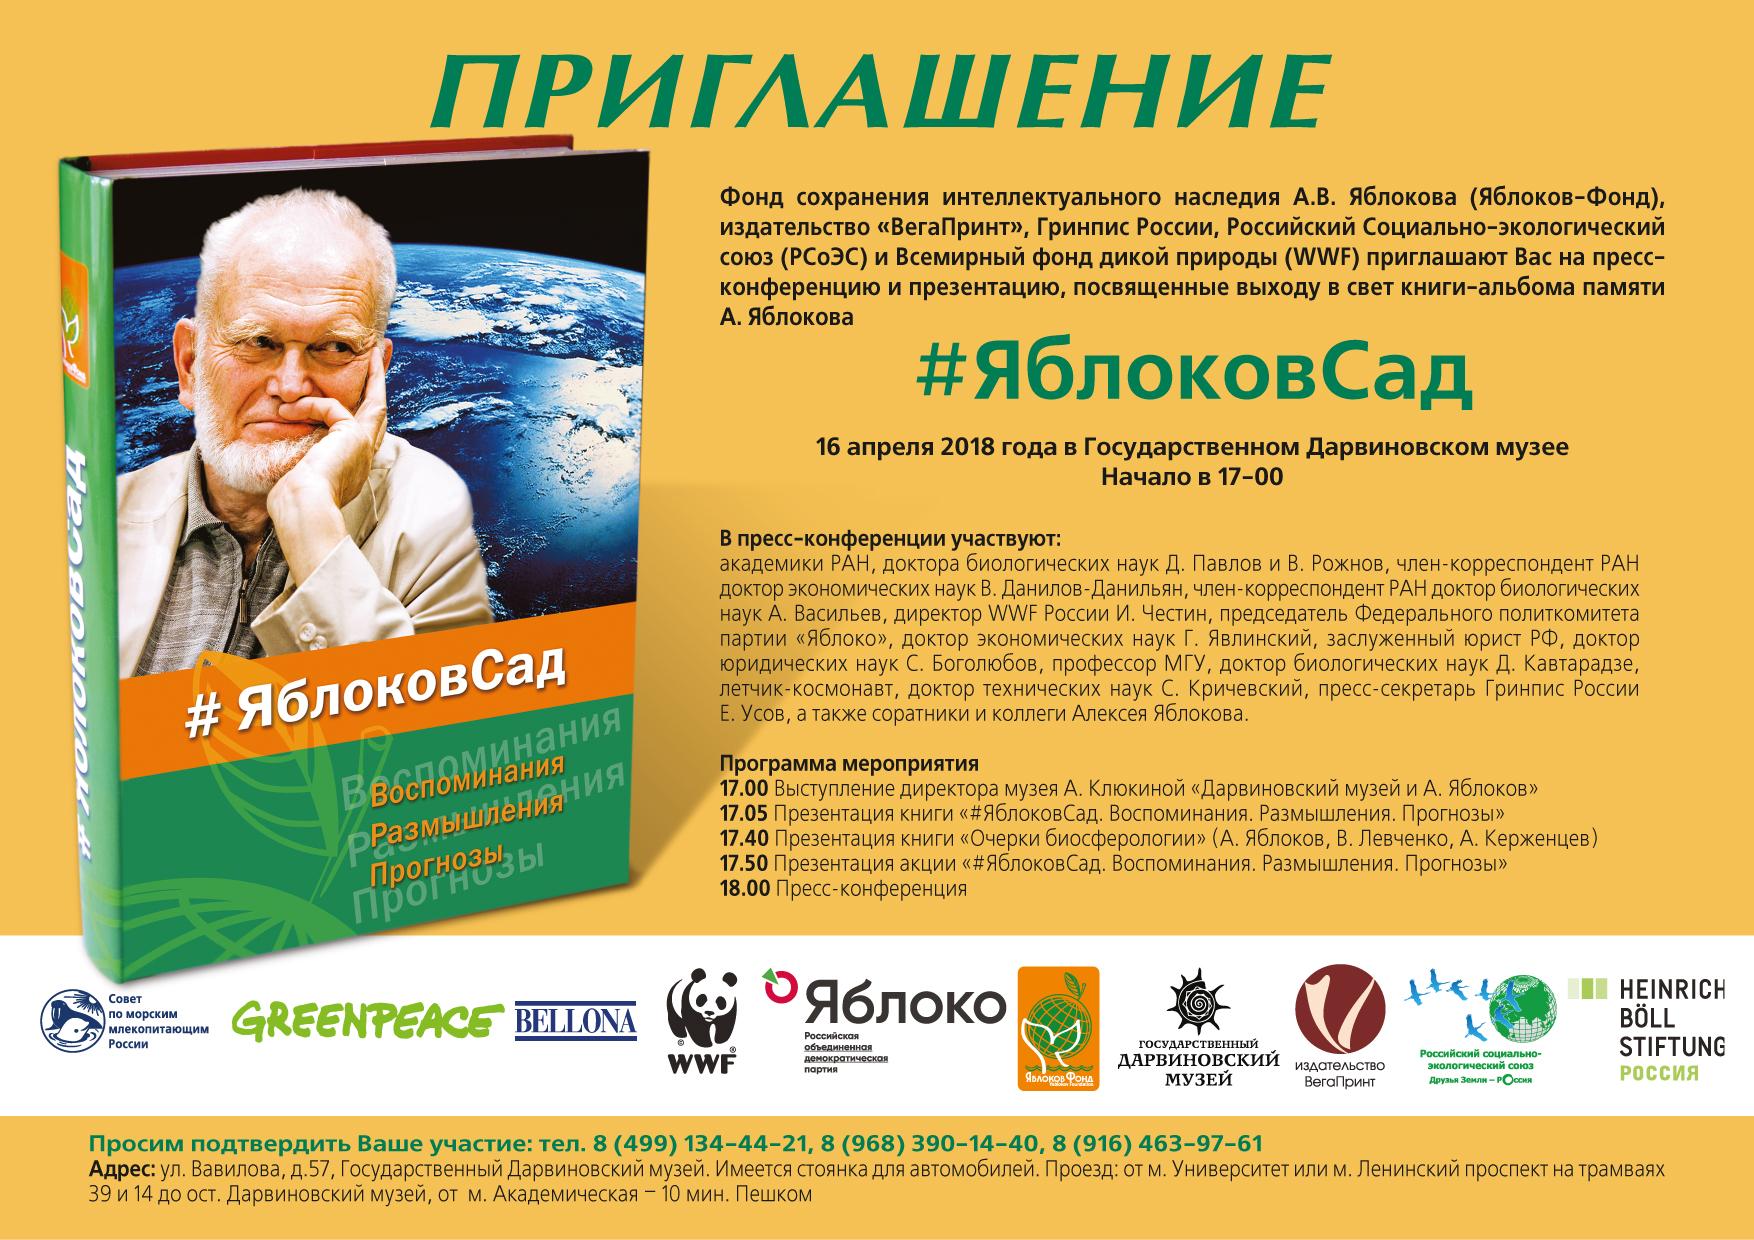 Invitation_yablokov.jpg